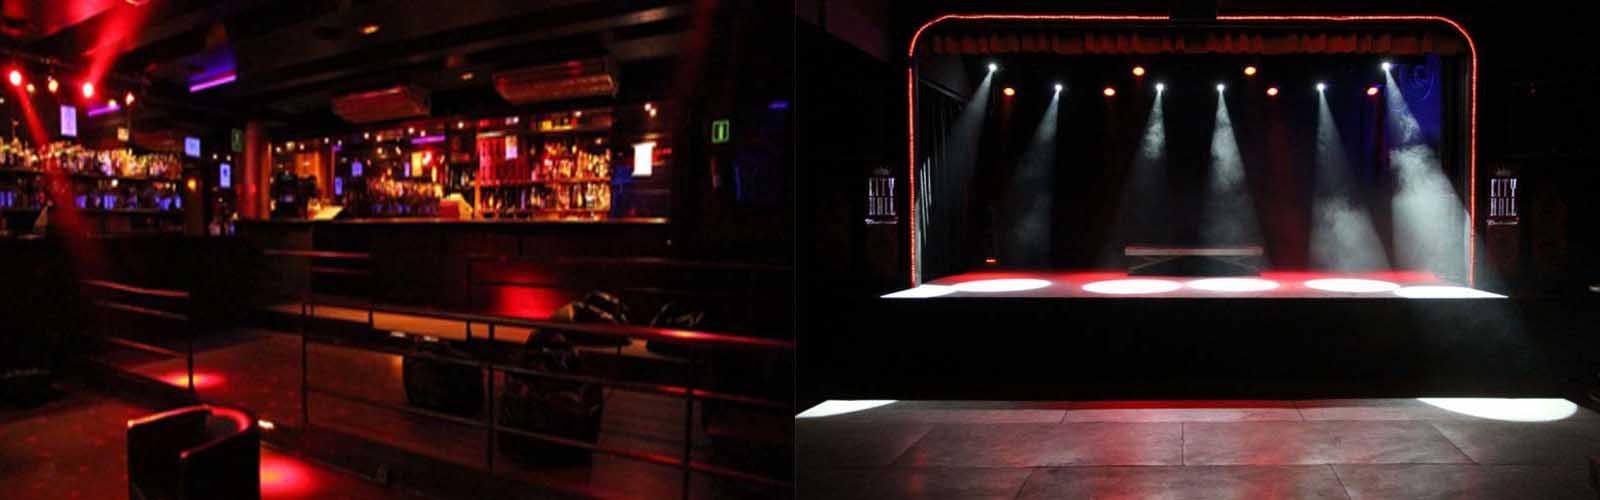 Experience the Barcelona Nightlife at Nightclub City Hall